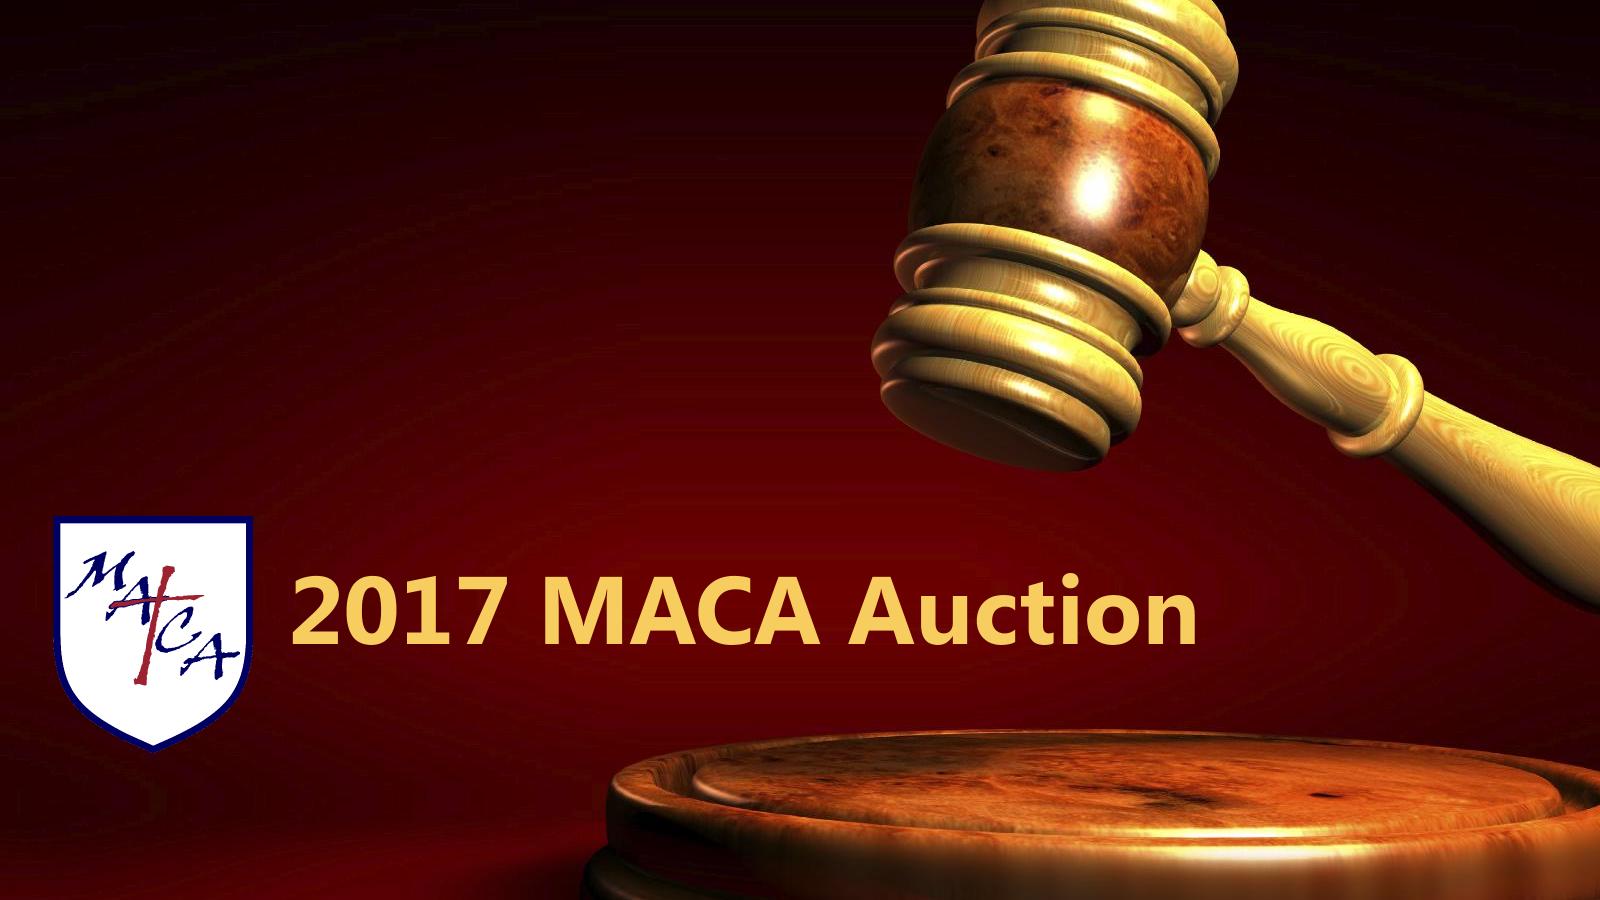 2017 MACA Auction